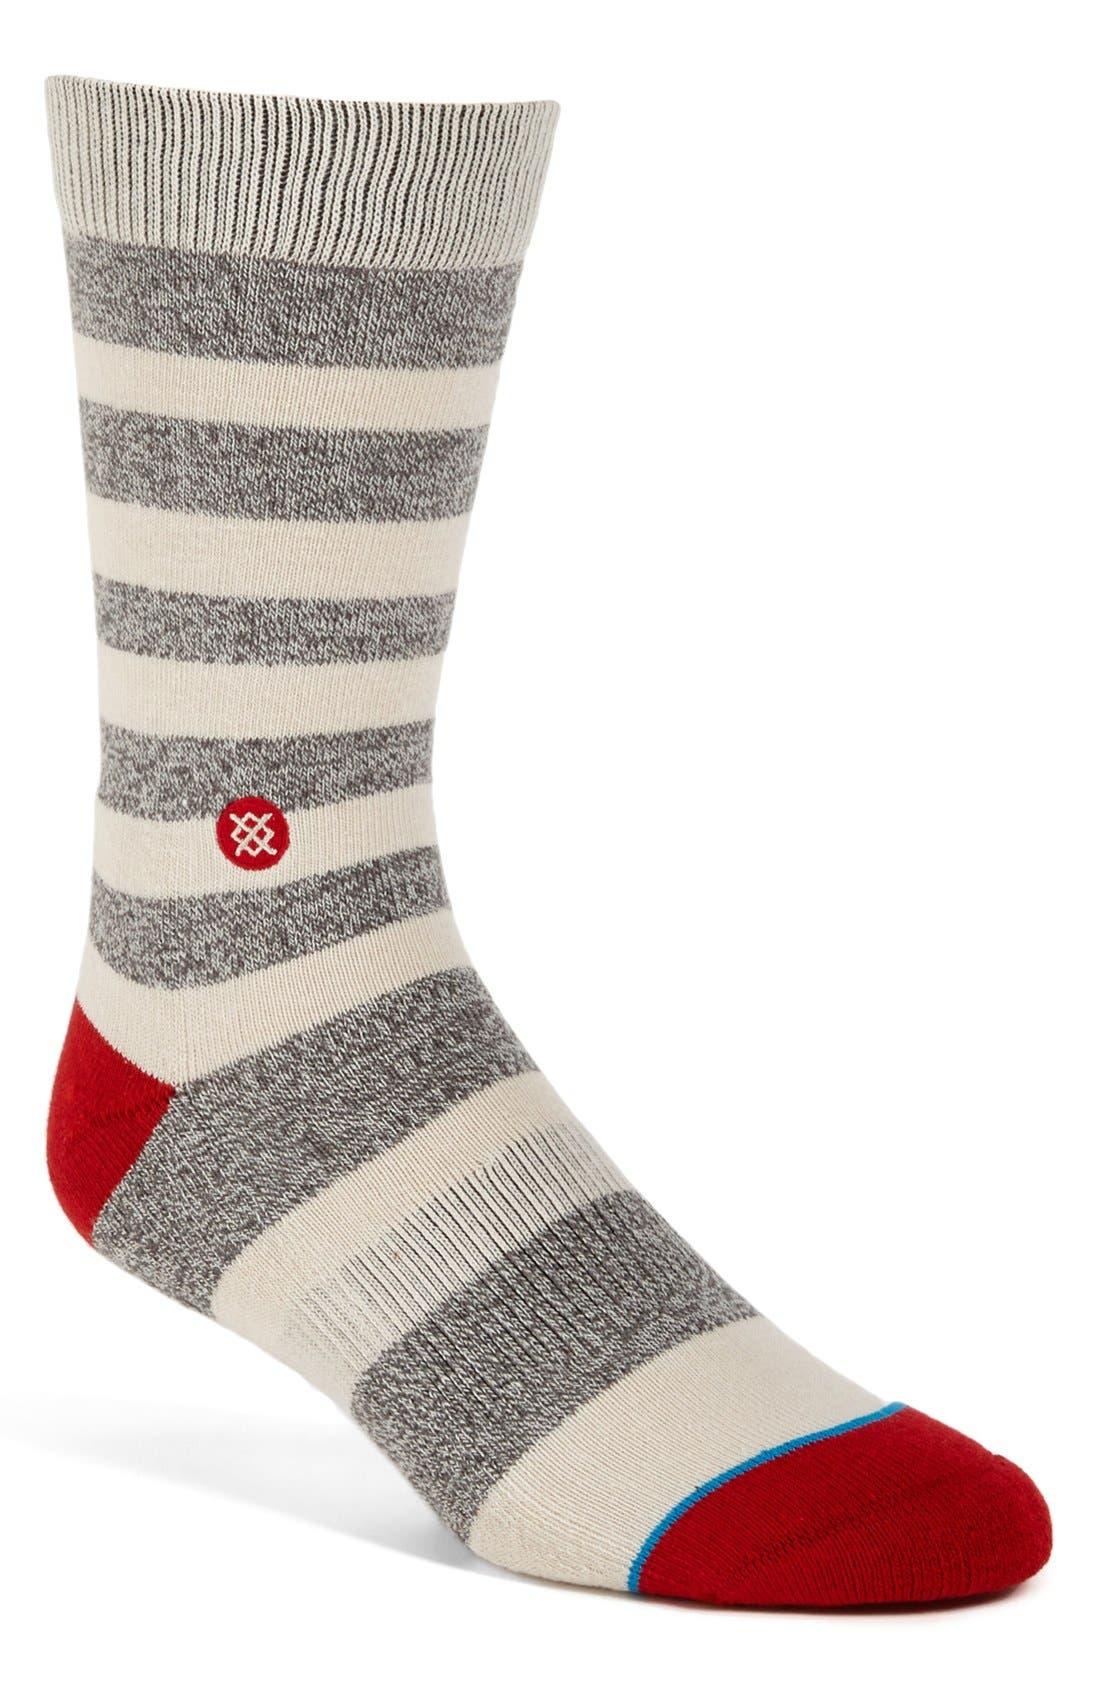 Main Image - Stance 'Striation' Socks